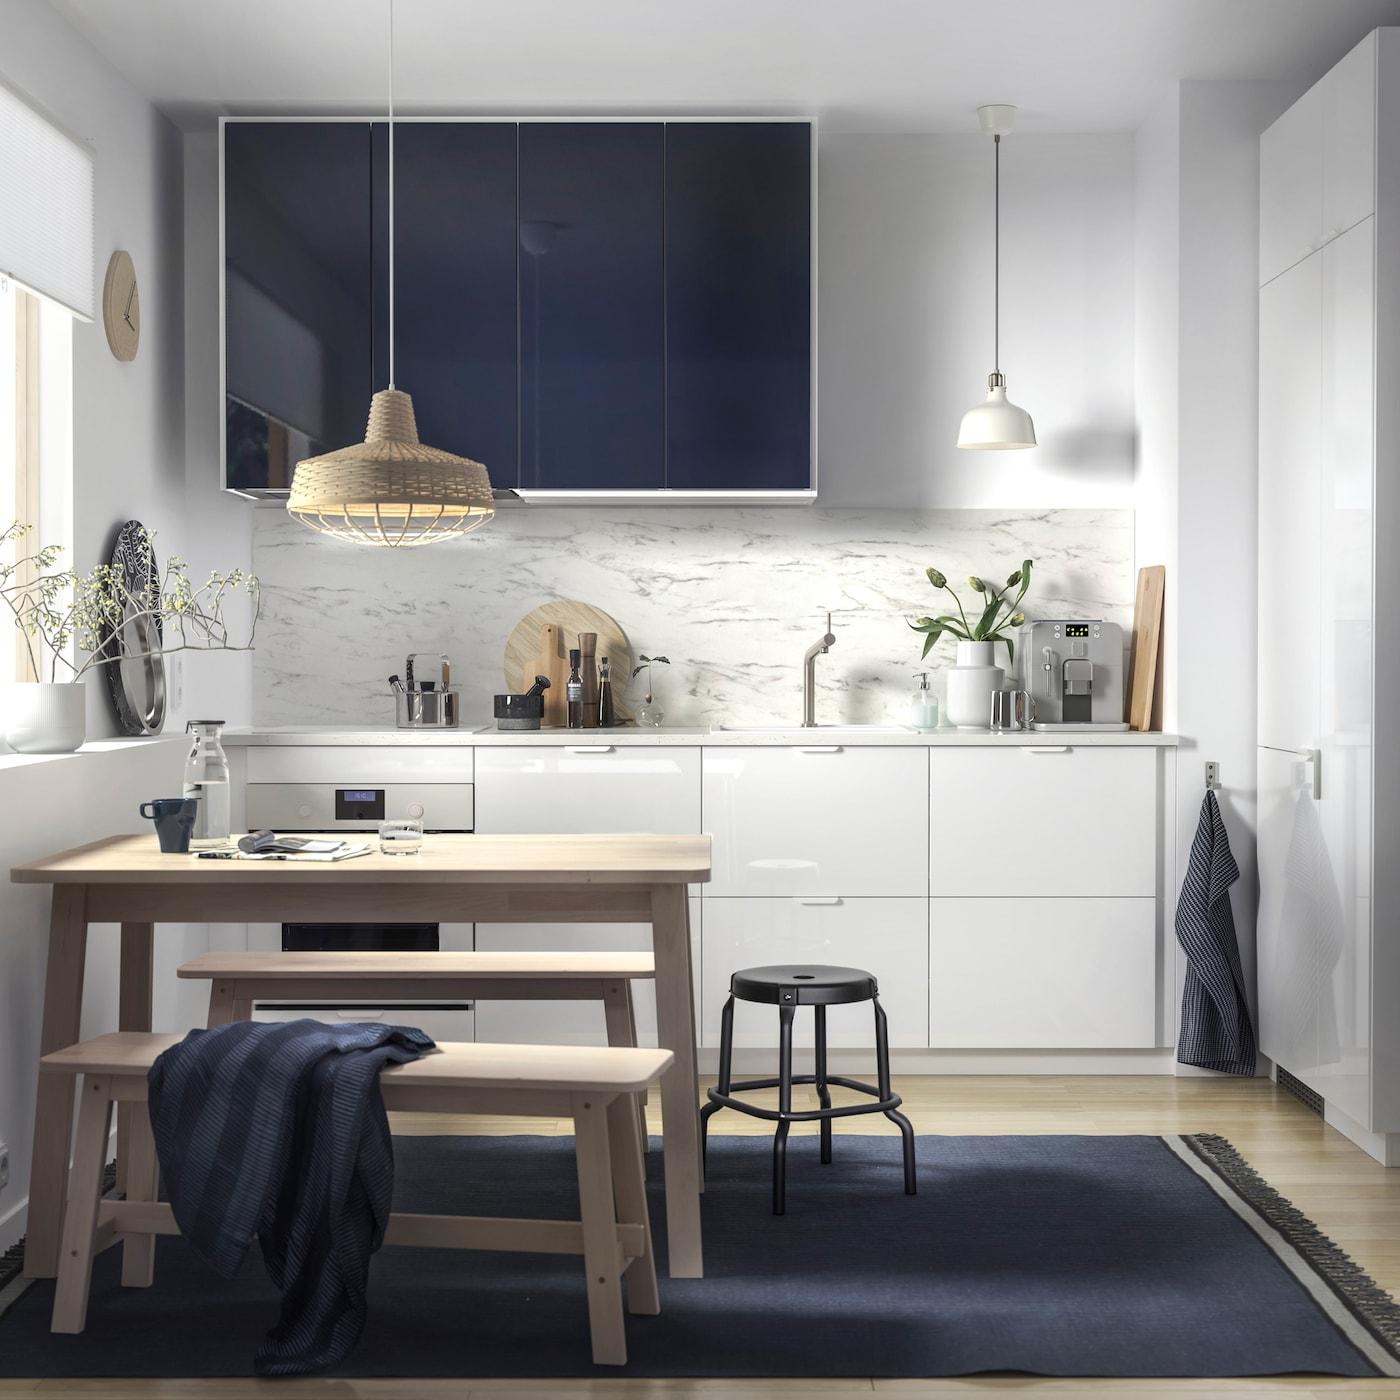 The sleek and sophisticated kitchenette - IKEA